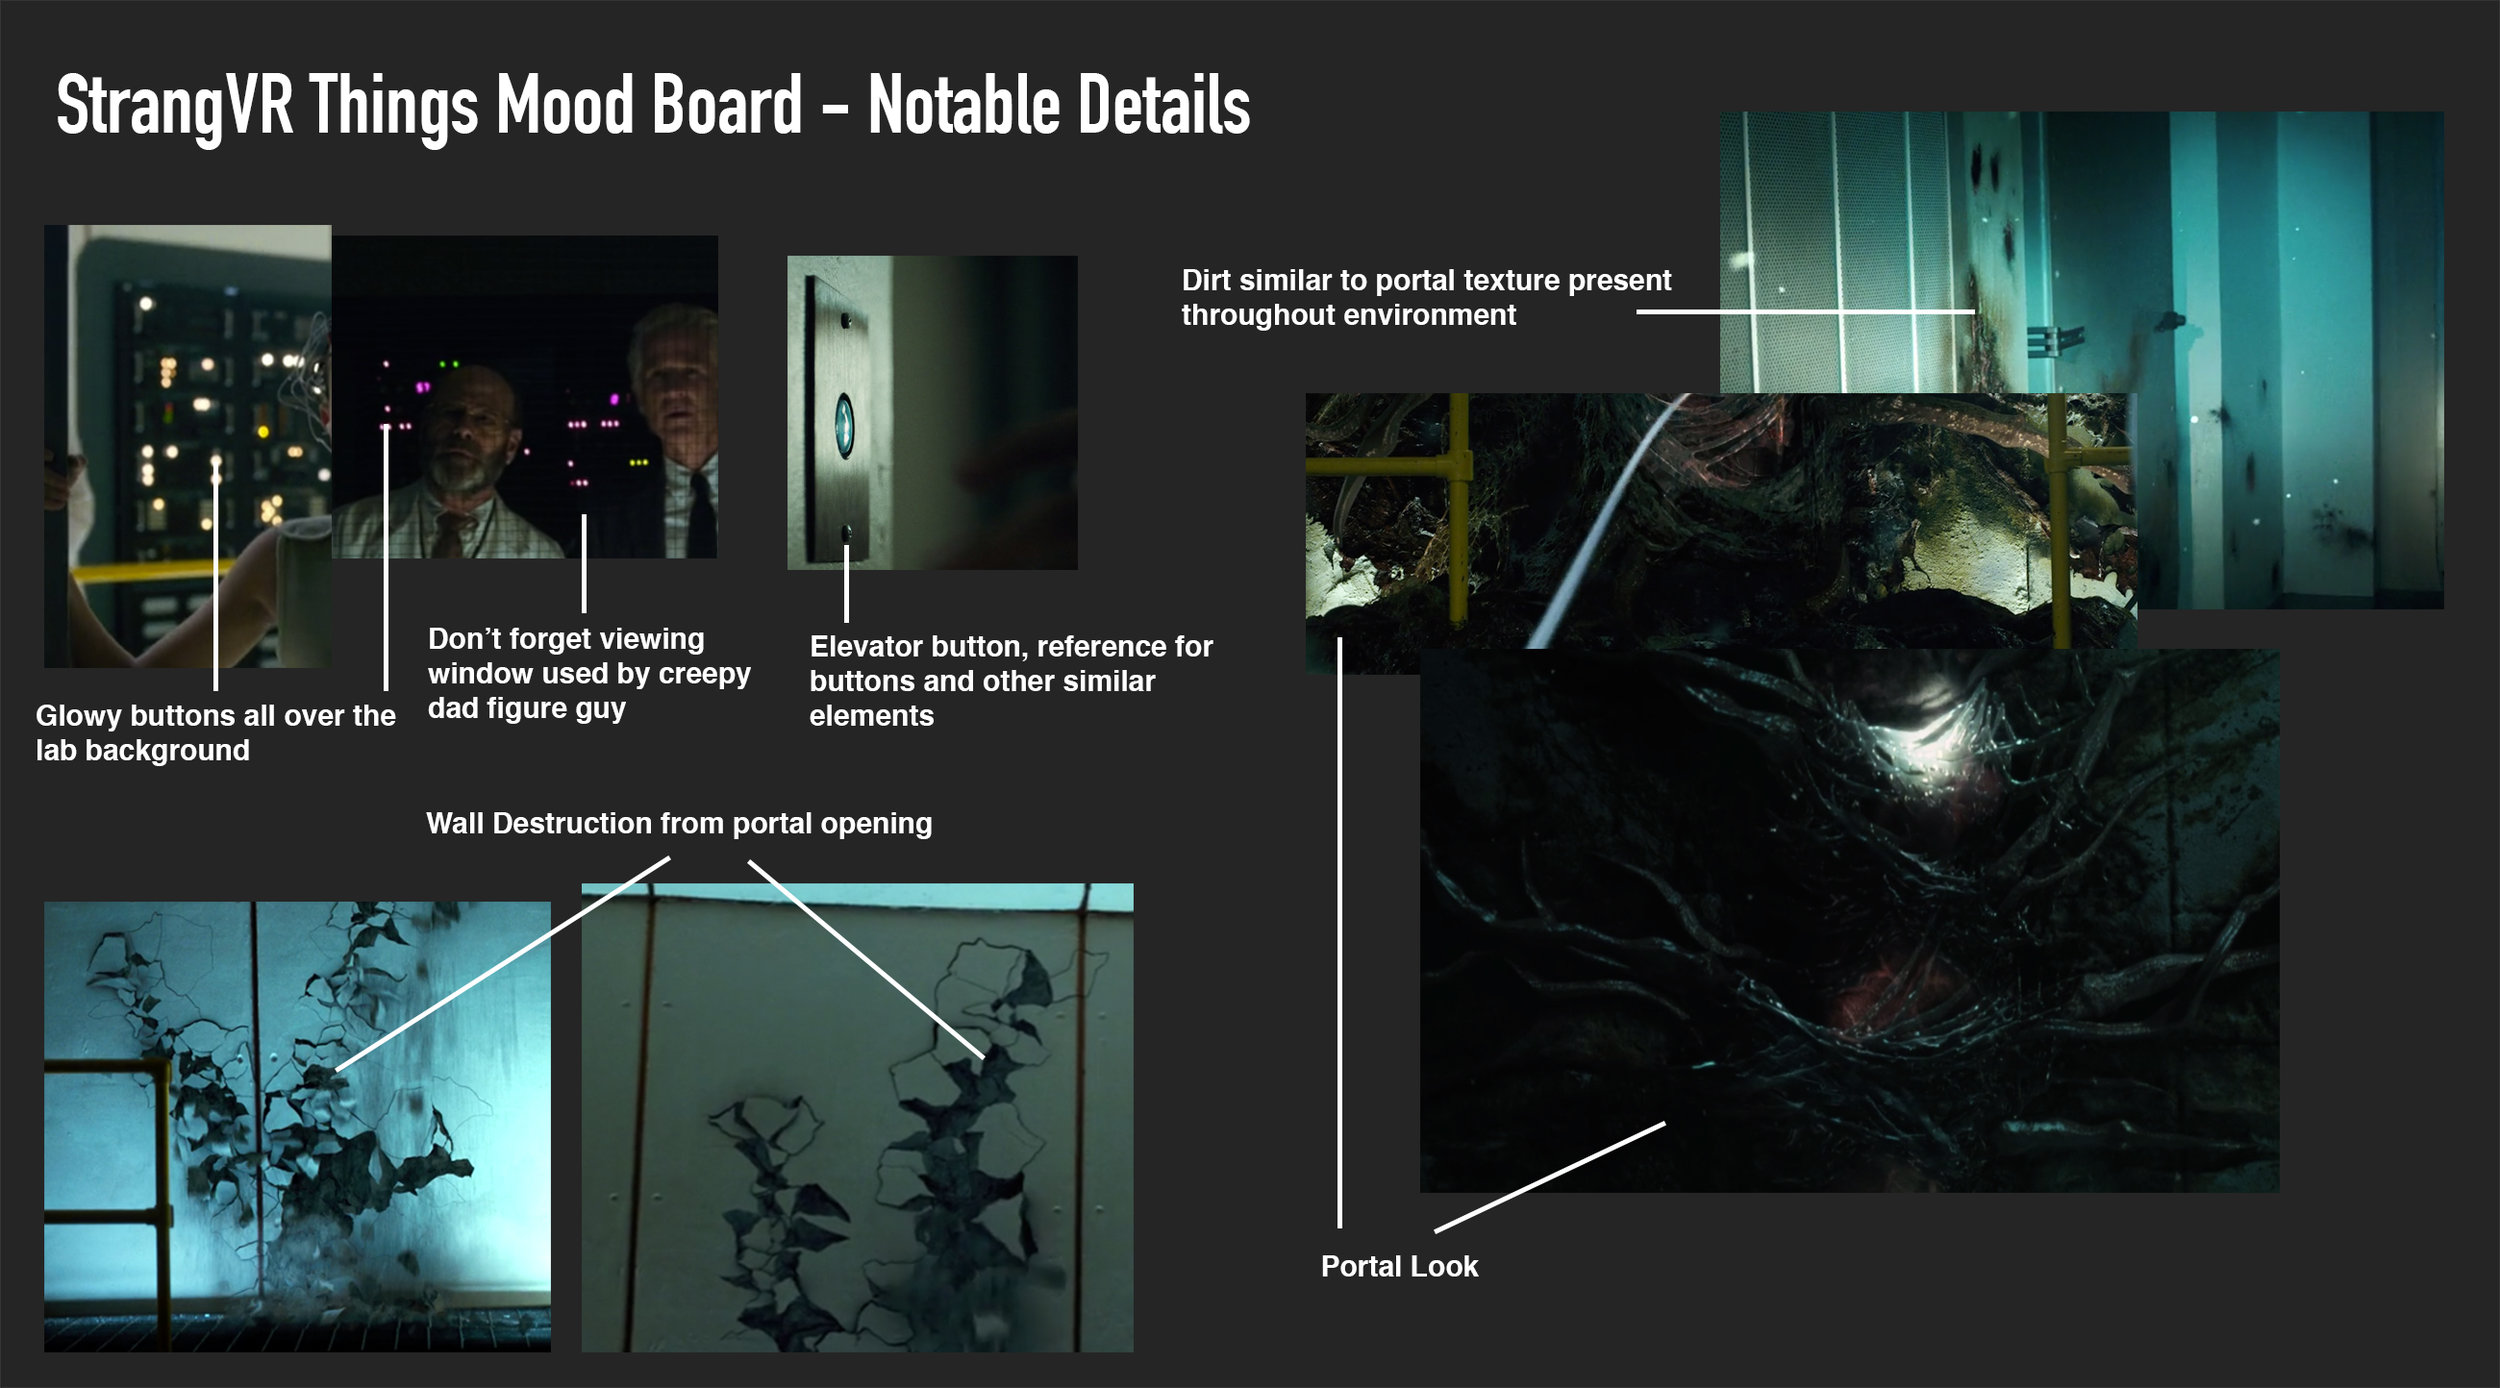 MoodBoard_Details2.jpg